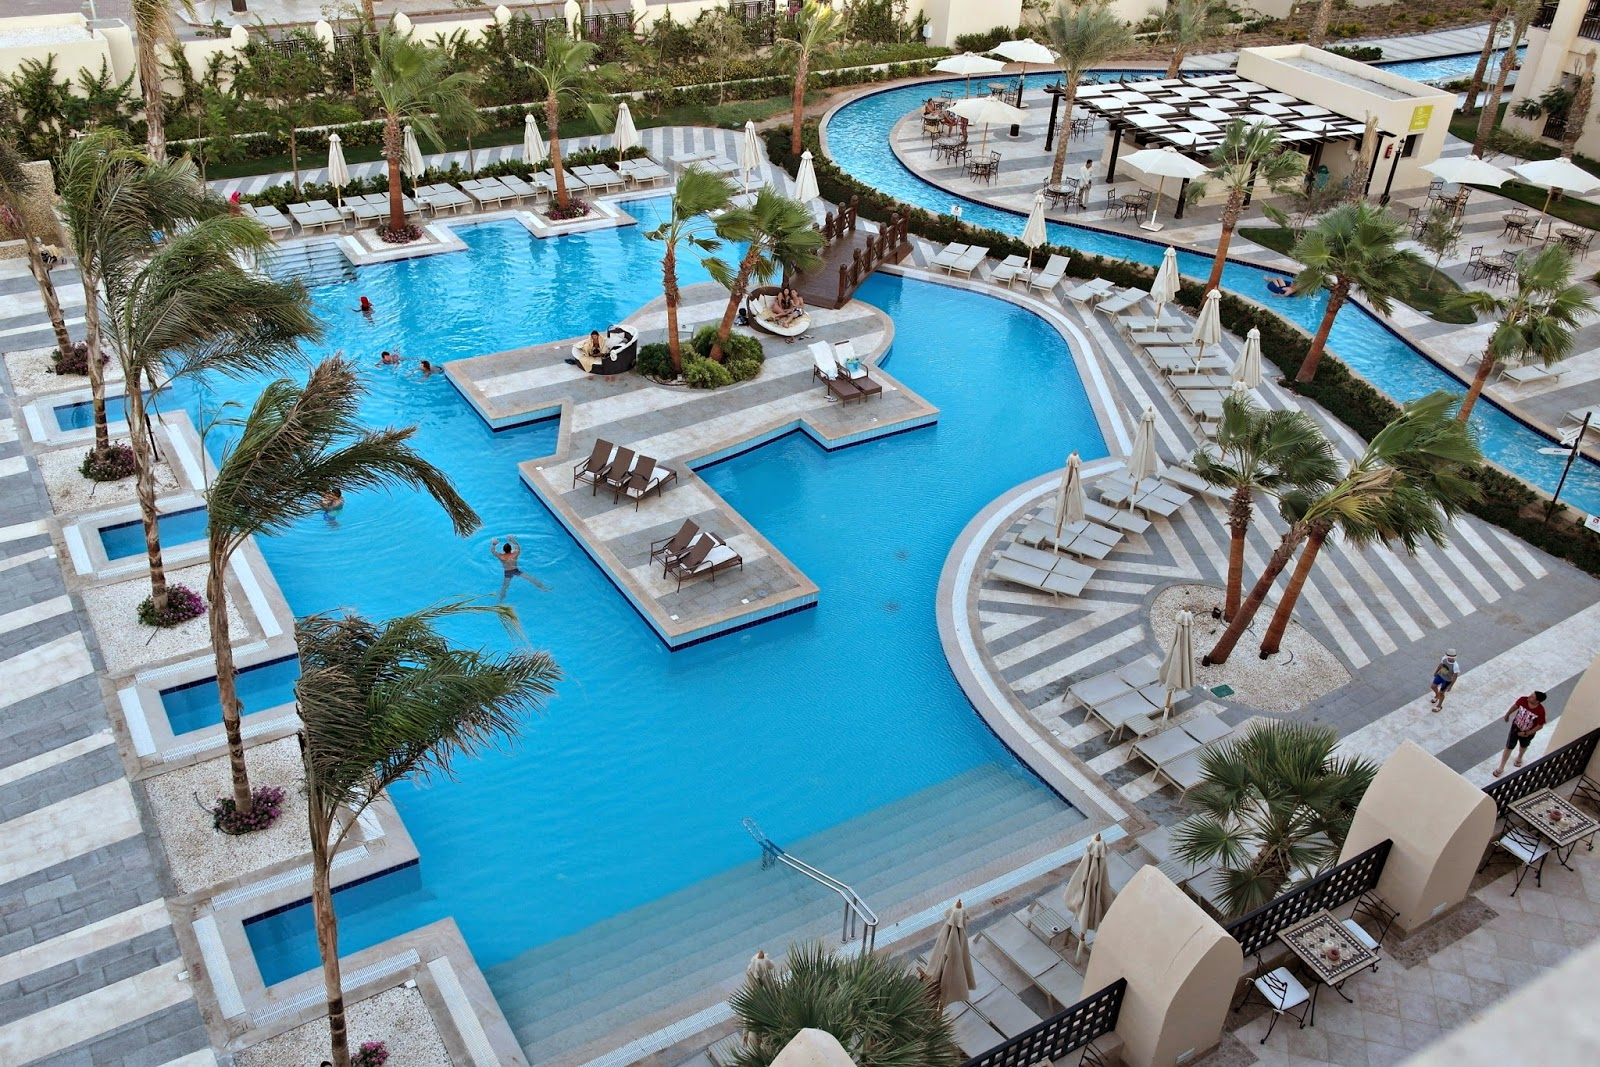 Egypt With Thomas Cook At Steigenberger Aqua Magic Redseastories